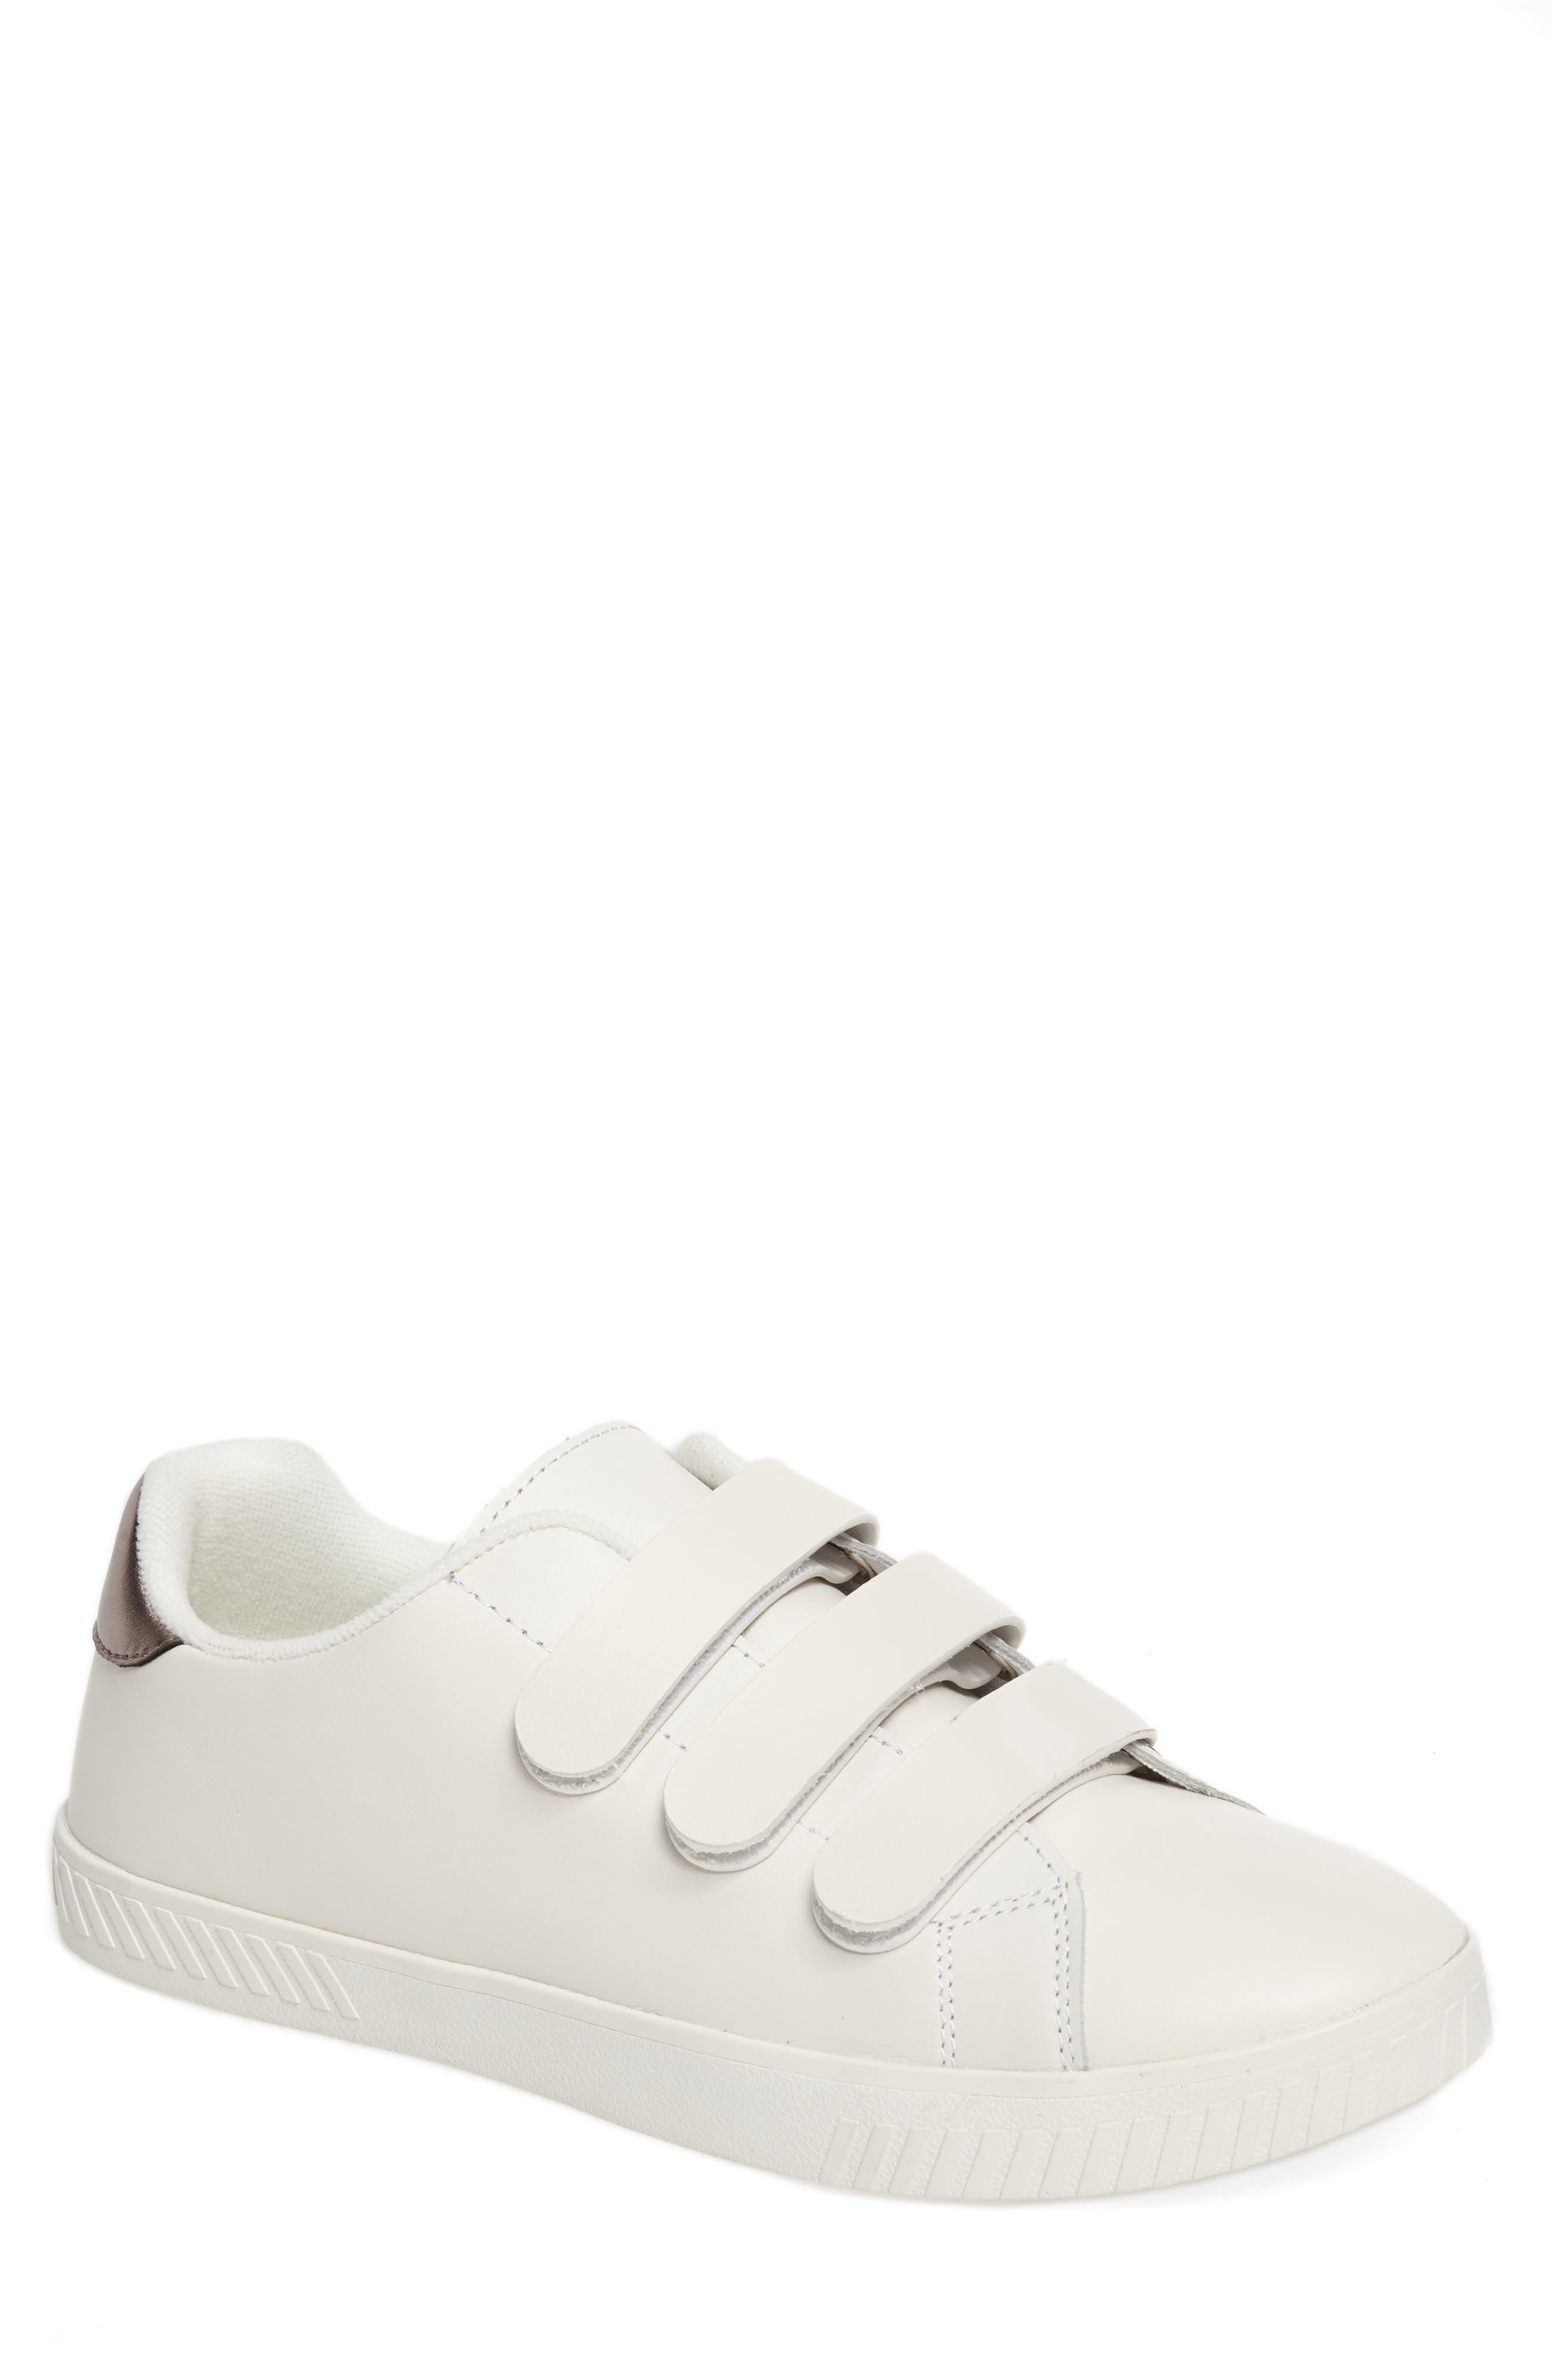 Alternate Image 1 Selected - Tretorn Carry 2 Sneaker (Men)